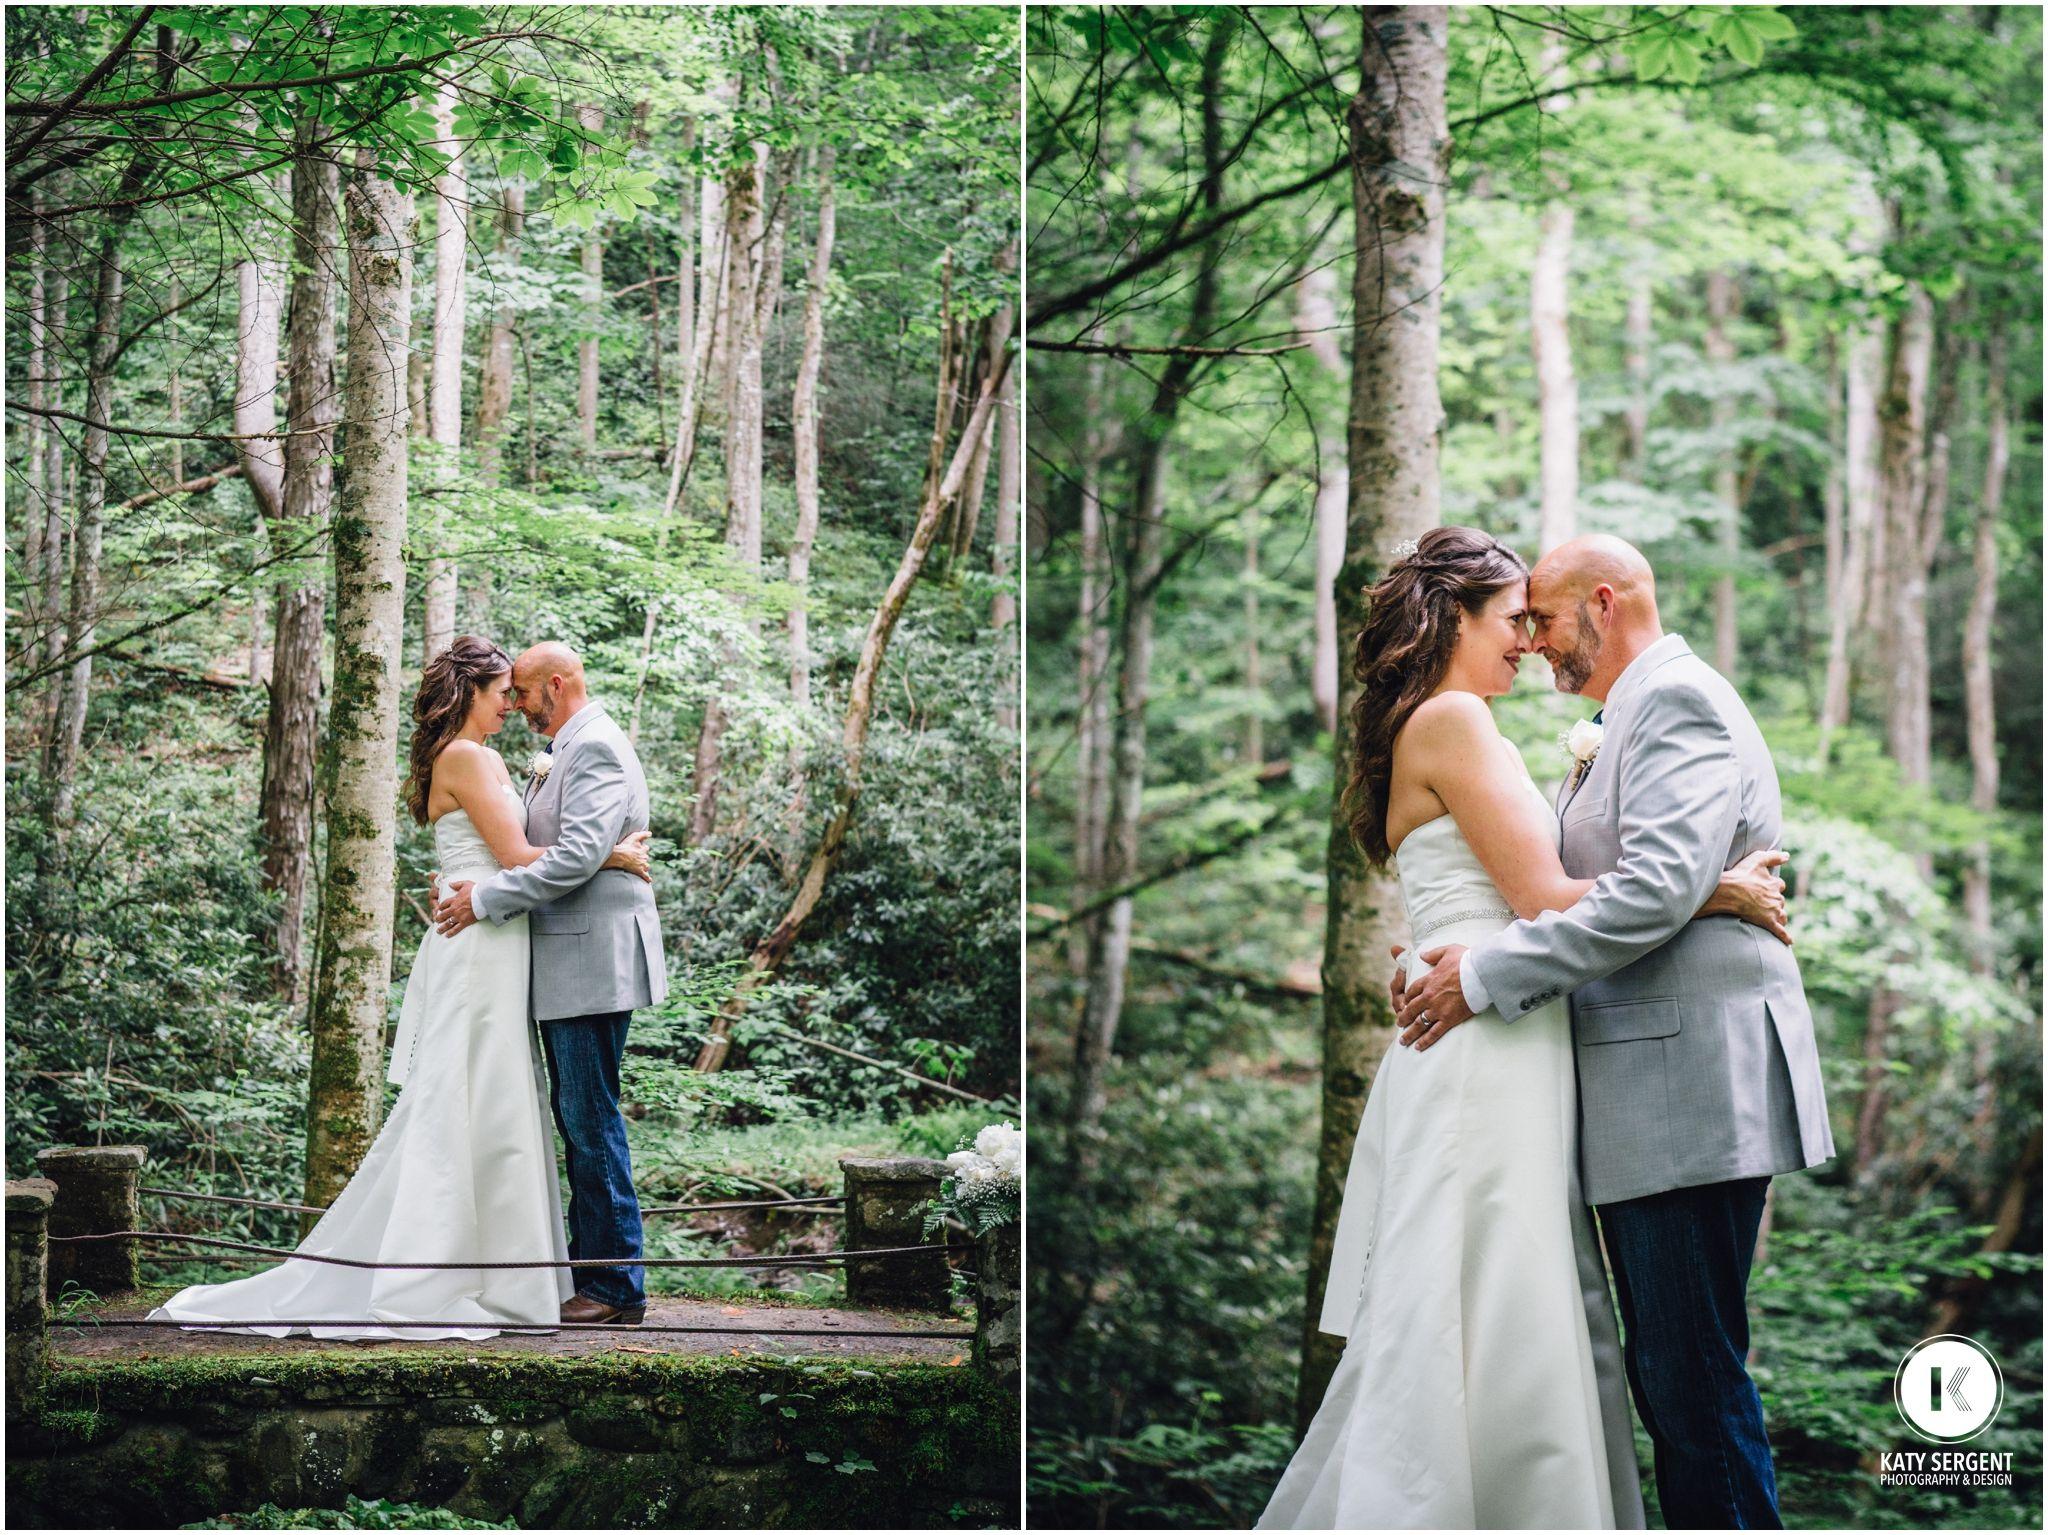 Amy's wedding dress  Gatlinburg TN Rob u Amyus Smoky Mountain Wedding  Gatlinburg